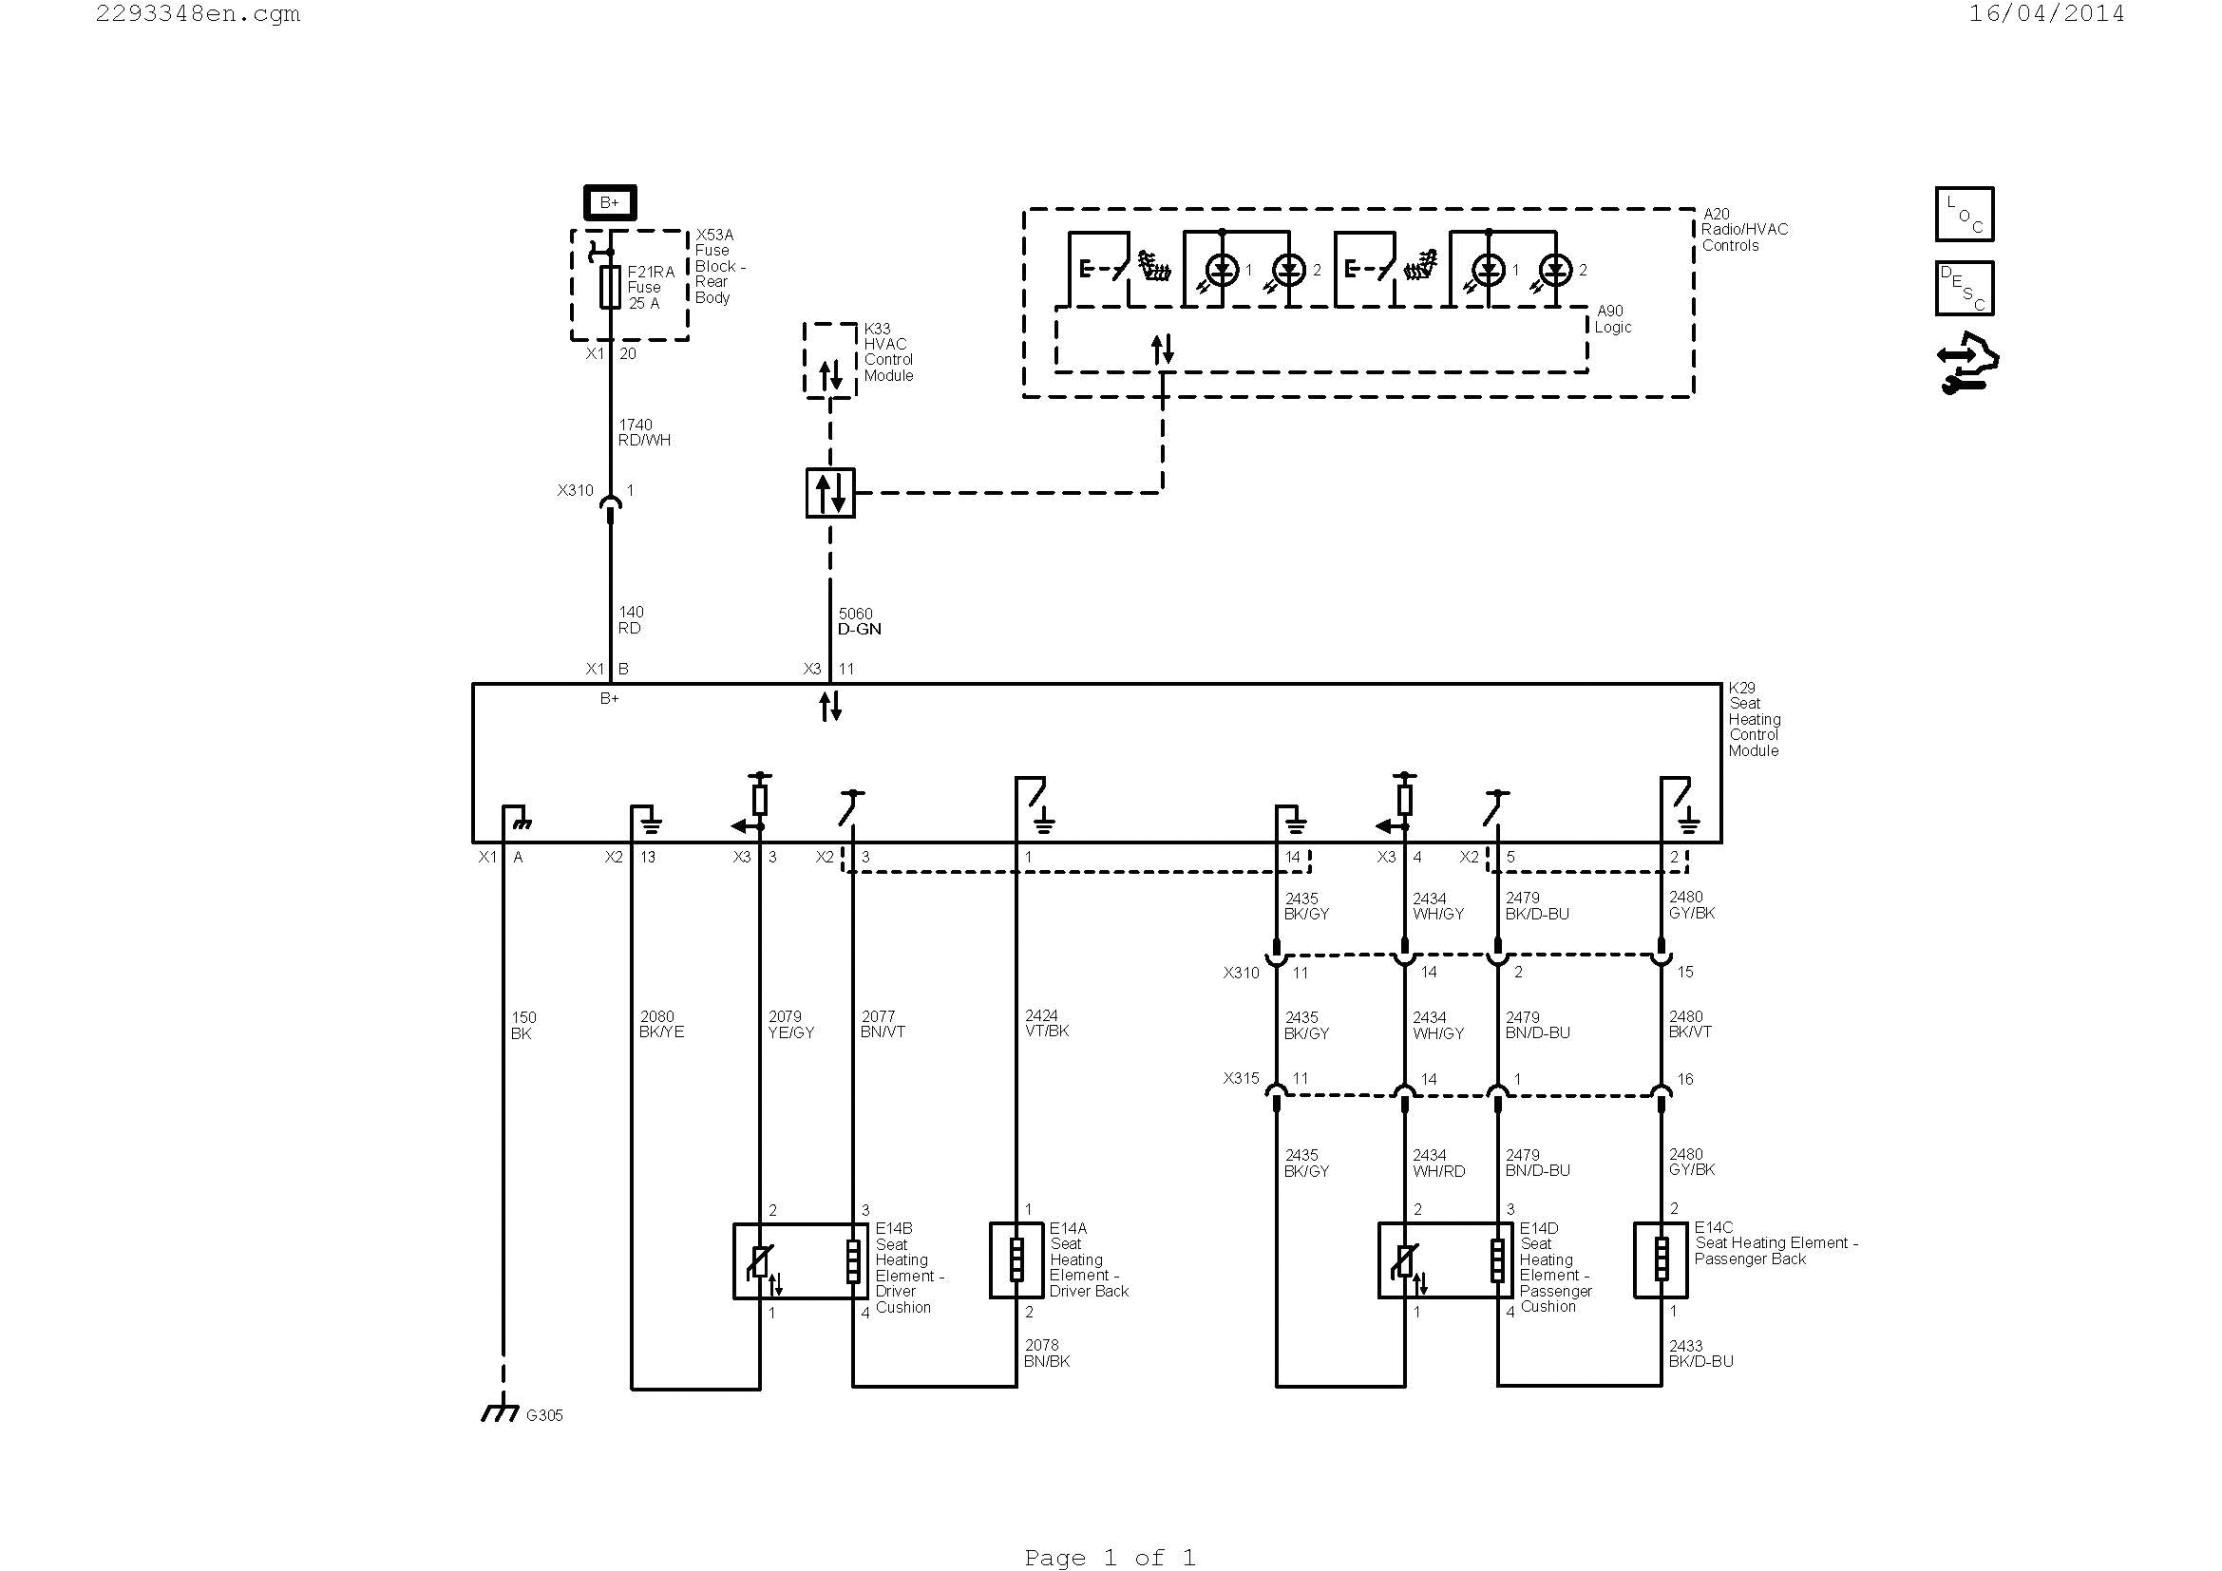 air suspension diagram high efficiency furnace venting diagram hvac diagram best hvac of air suspension diagram jpg